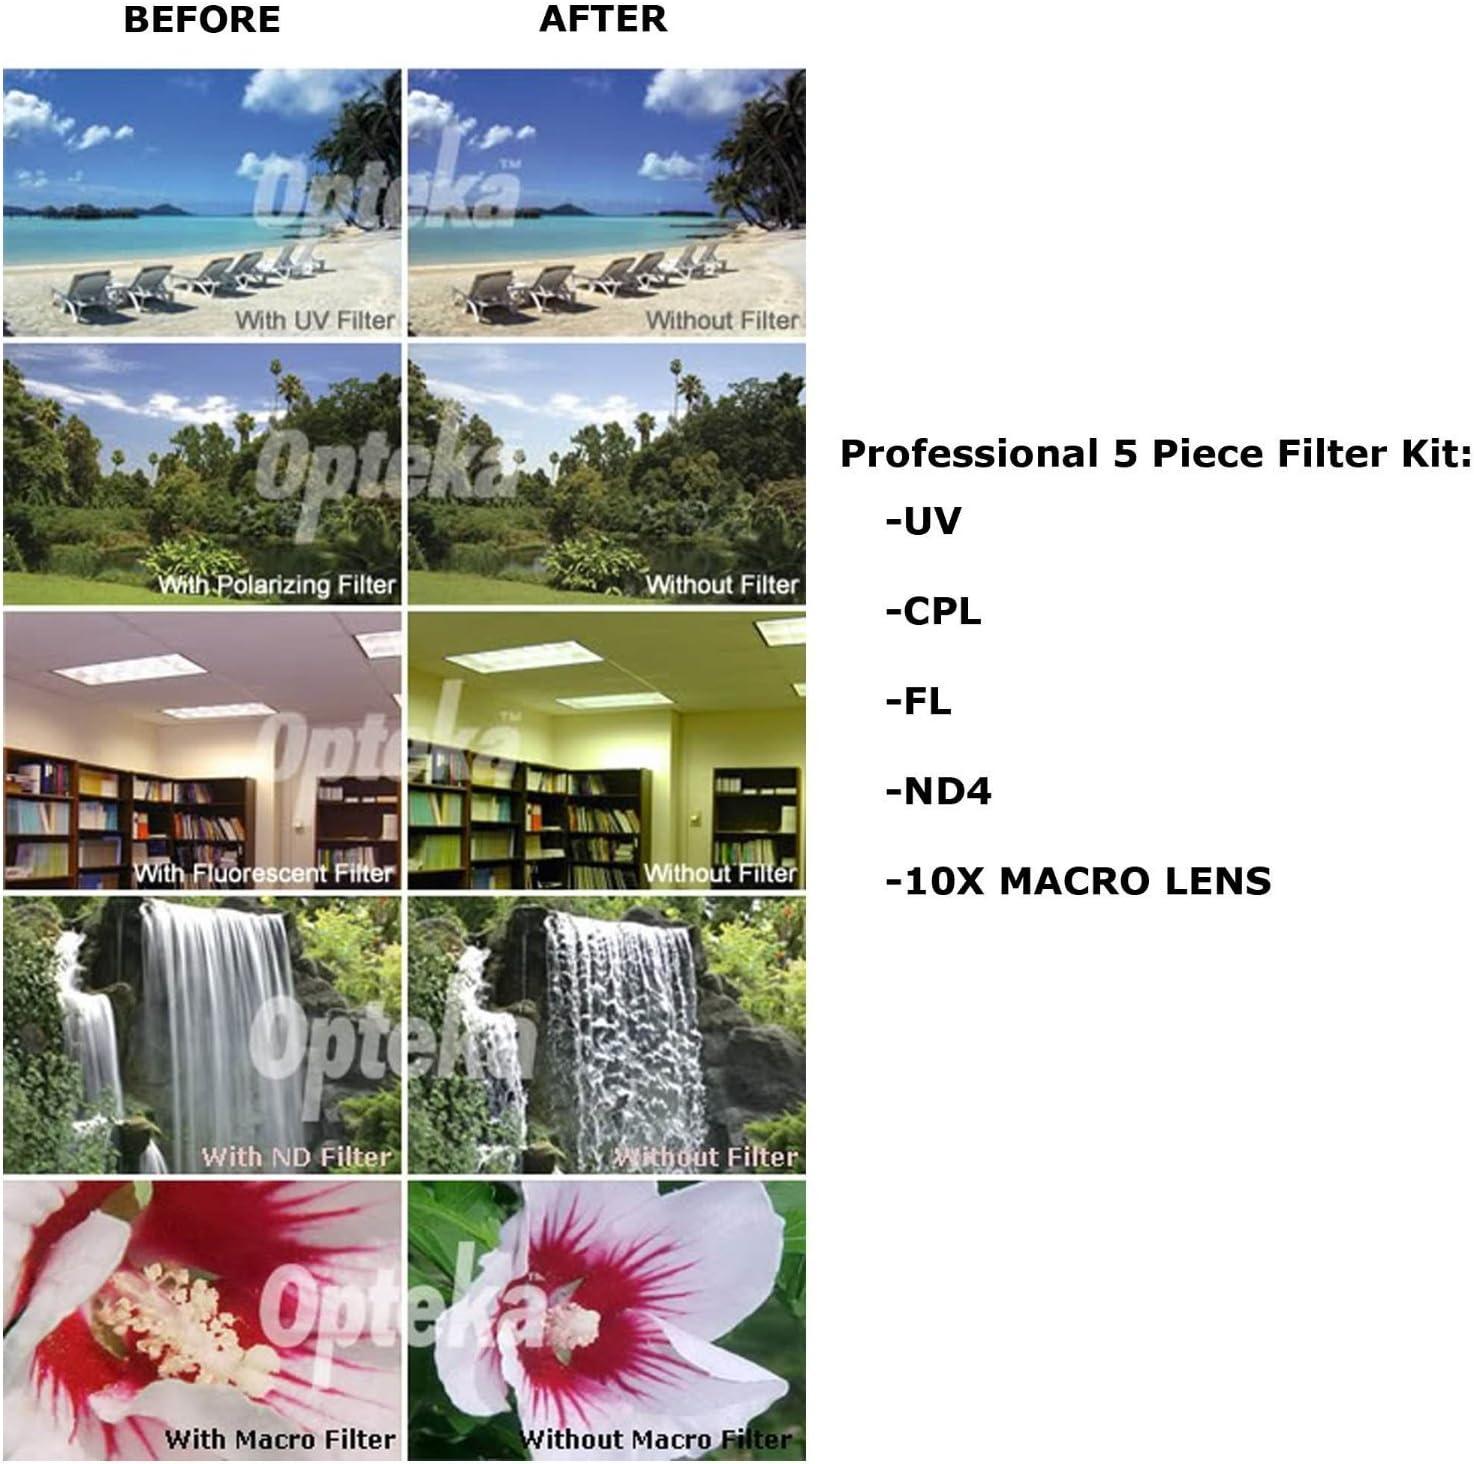 2.2x Extreme High Definitio 10 Piece Ultimate Lens Package For the Nikon D100 D200 D300 D300S D700 D7000 D7100 D3000 D3100 D3200 D5000 D5100 D5200 D5300 D40 D40X D50 D60 D70 D90 D80 Includes .43x High Definition II Wide Angle Panoramic Macro Fisheye Lens